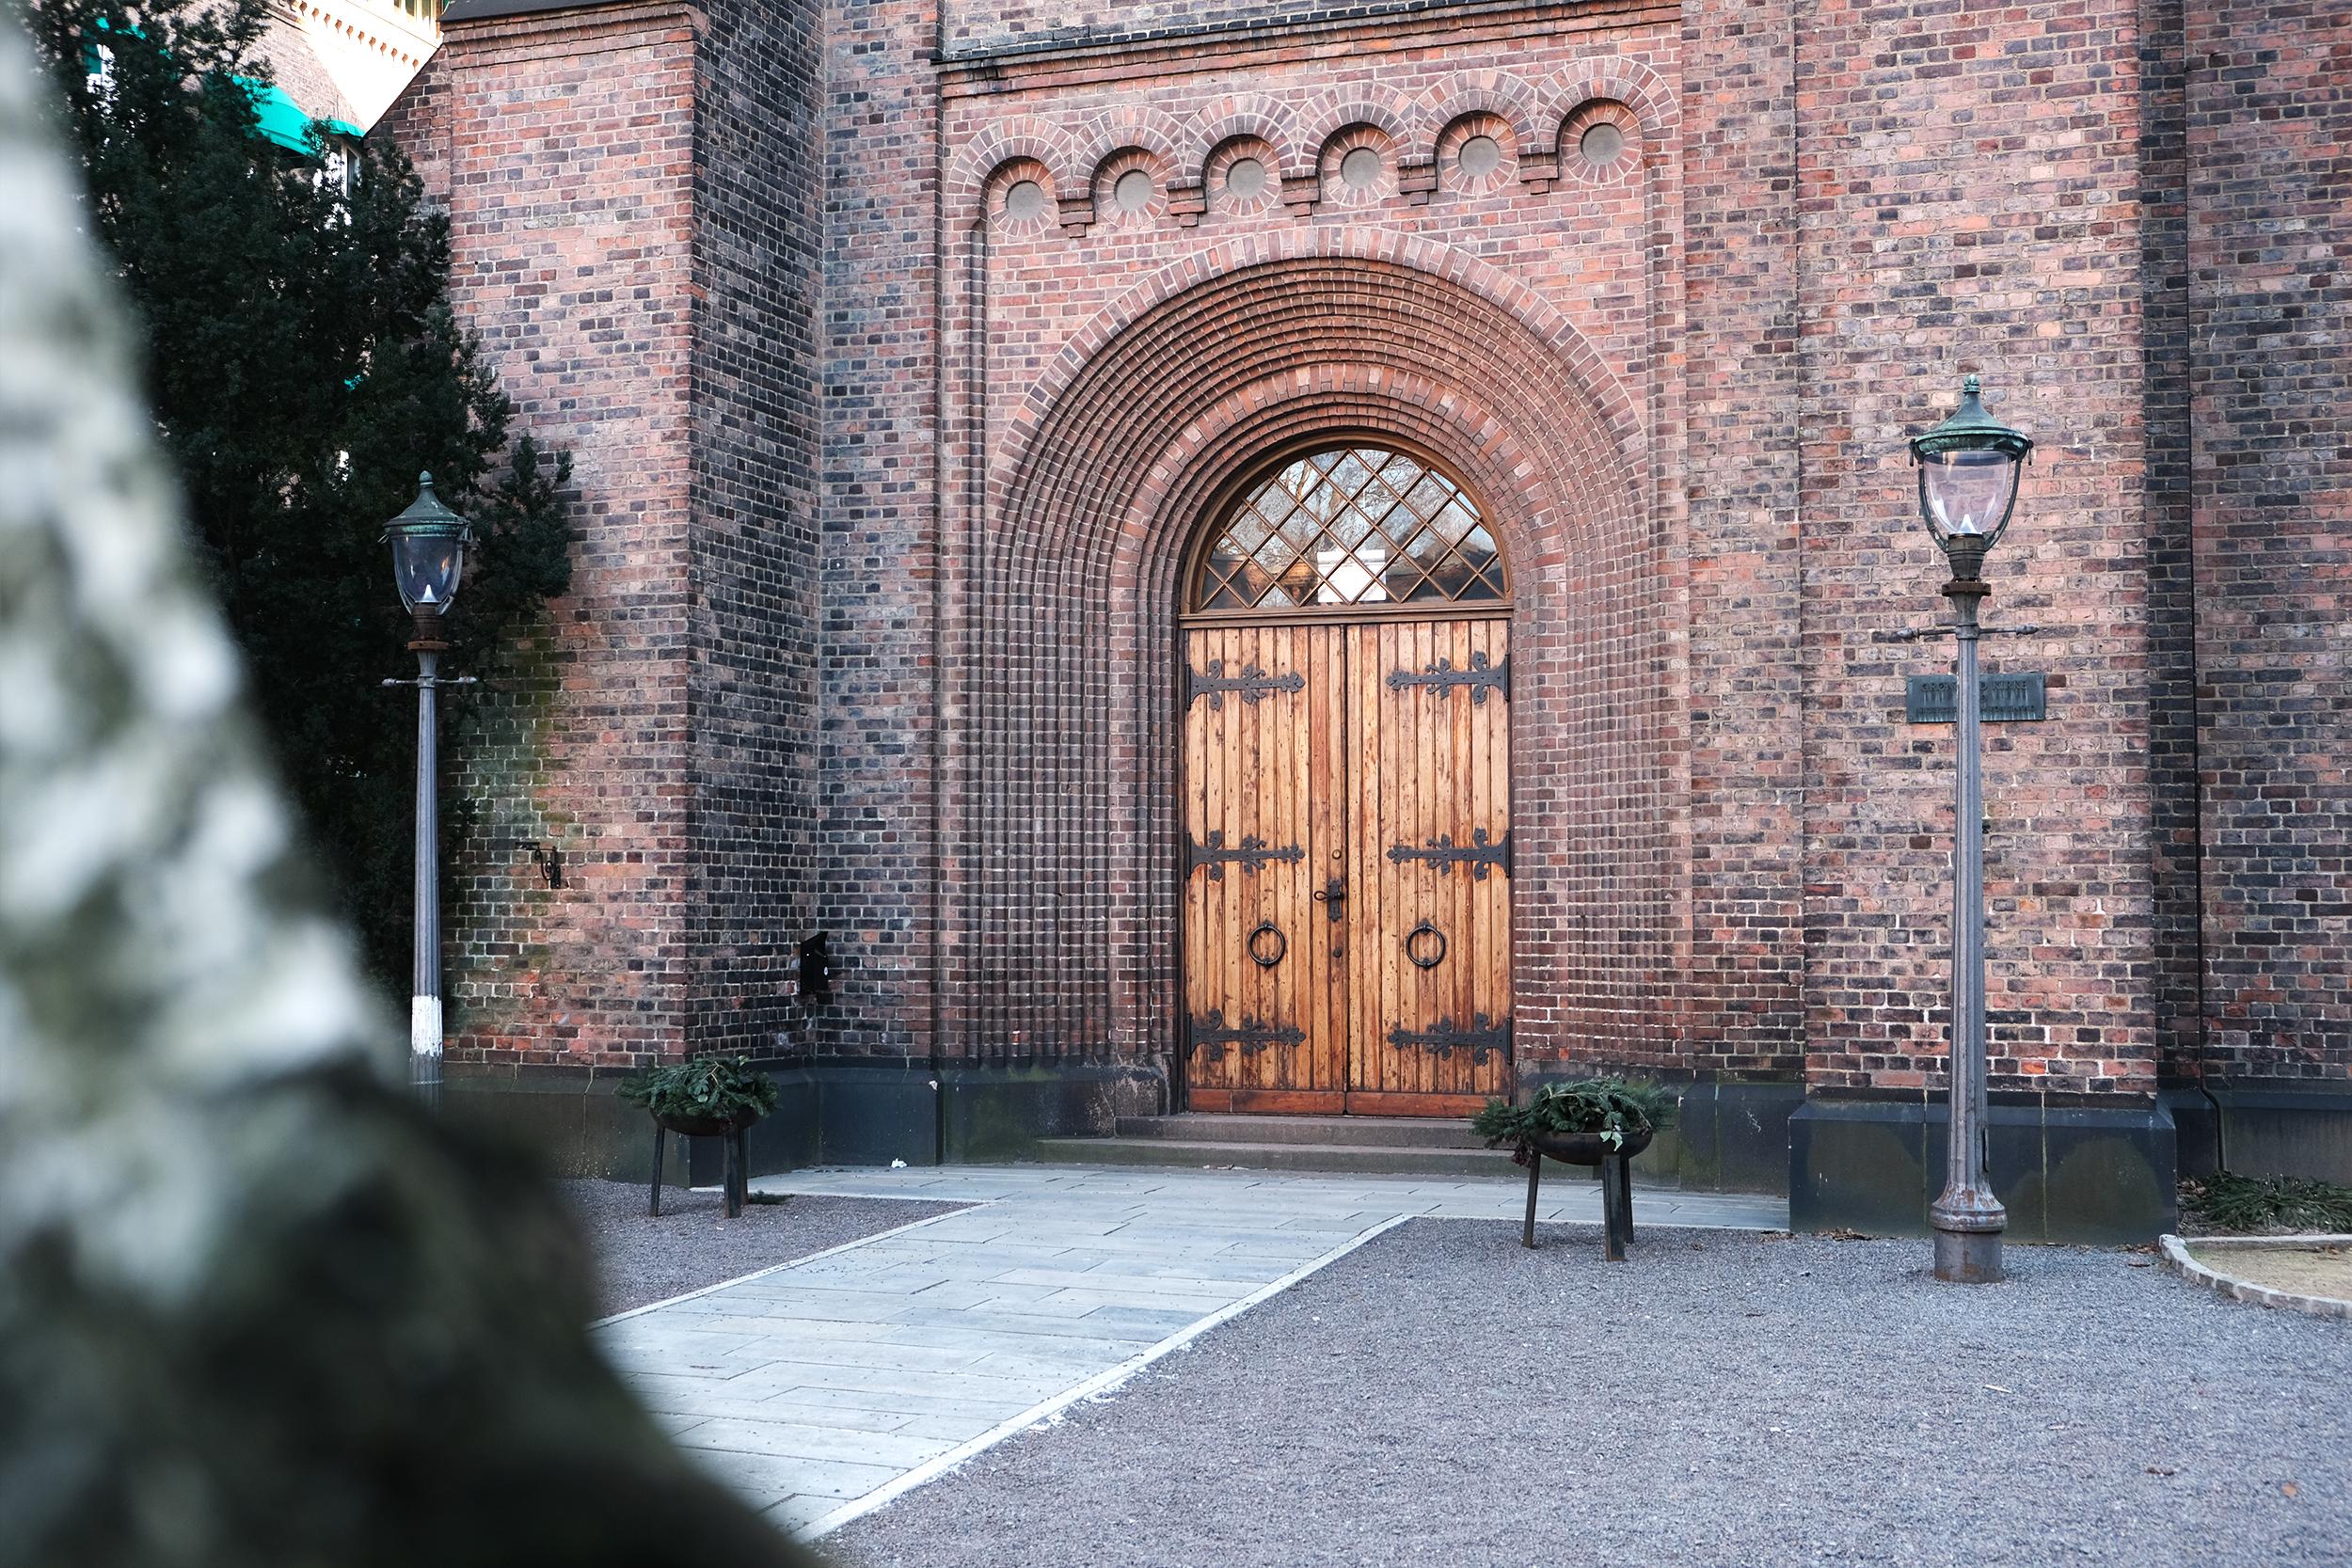 En inngangsdør til en norsk steinkirke.